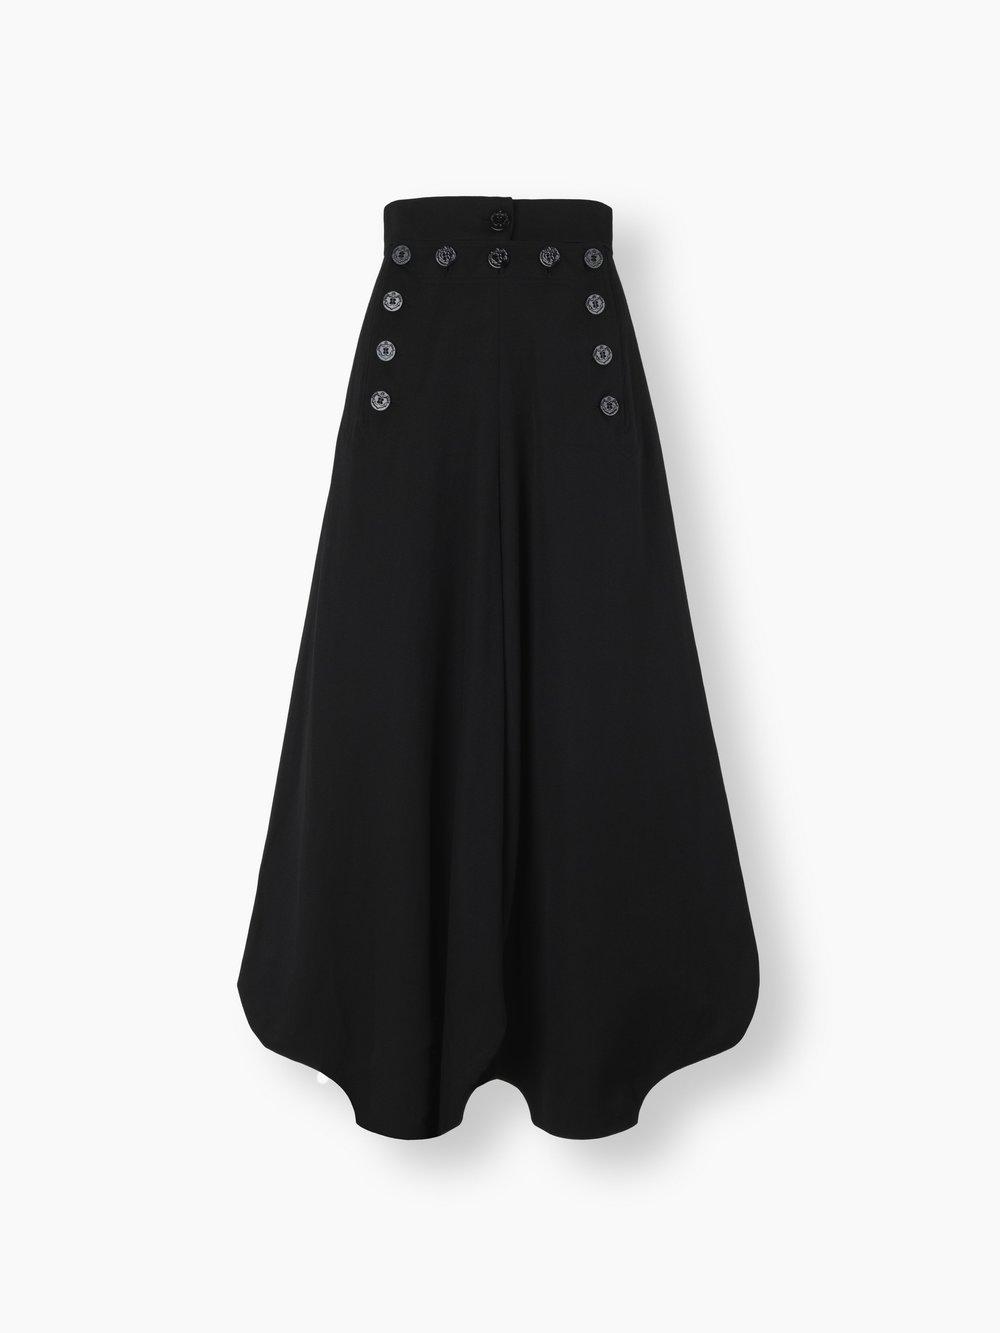 Chloe Sailor Pants